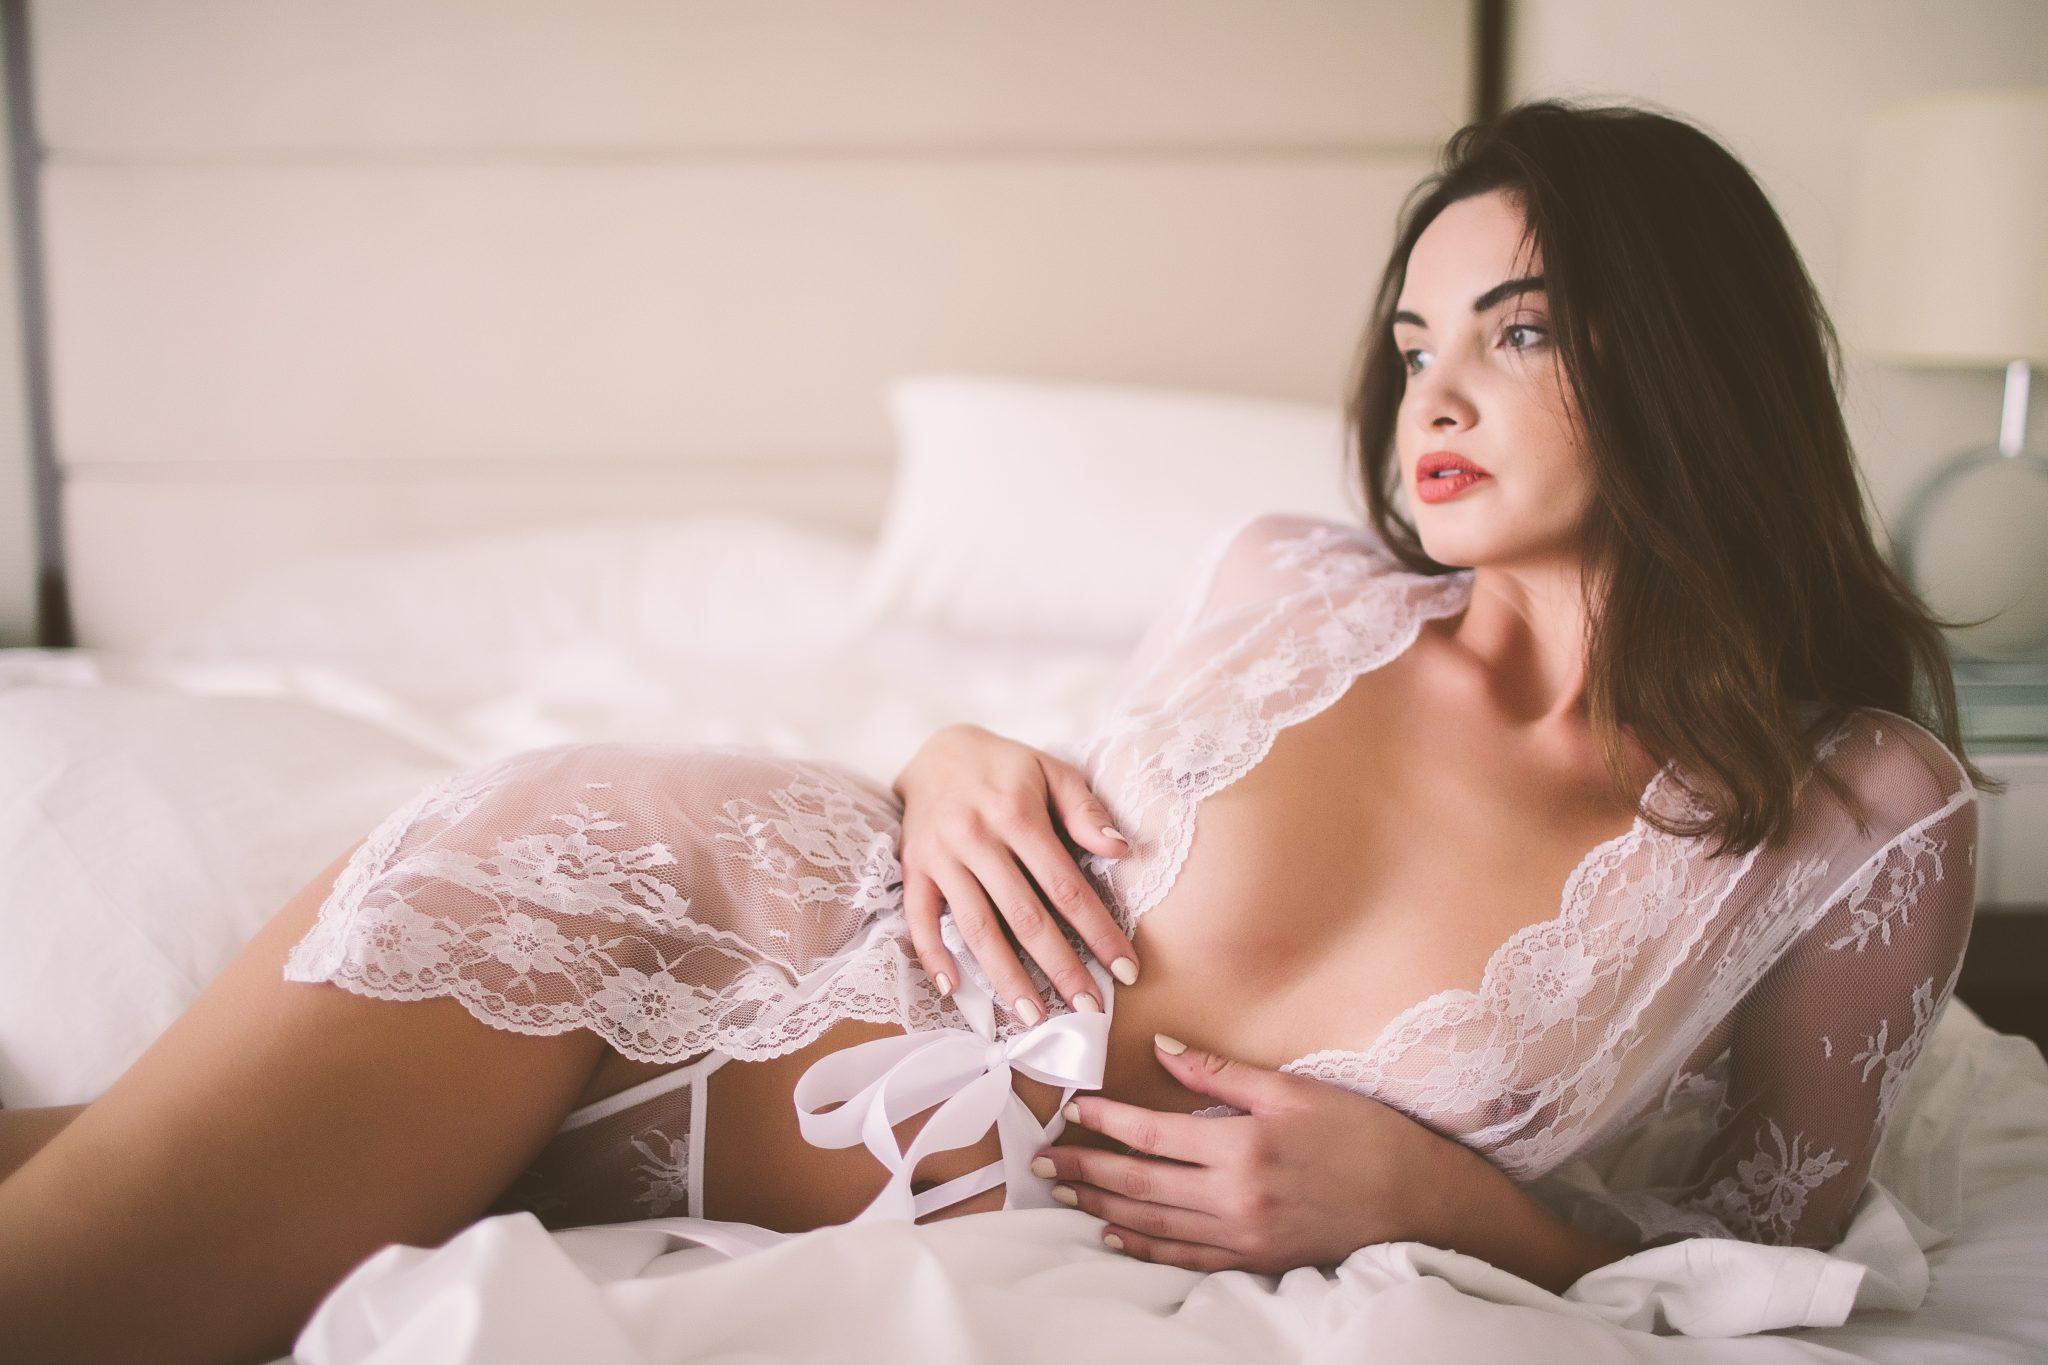 Model taking a sensual photo wearing lingerie